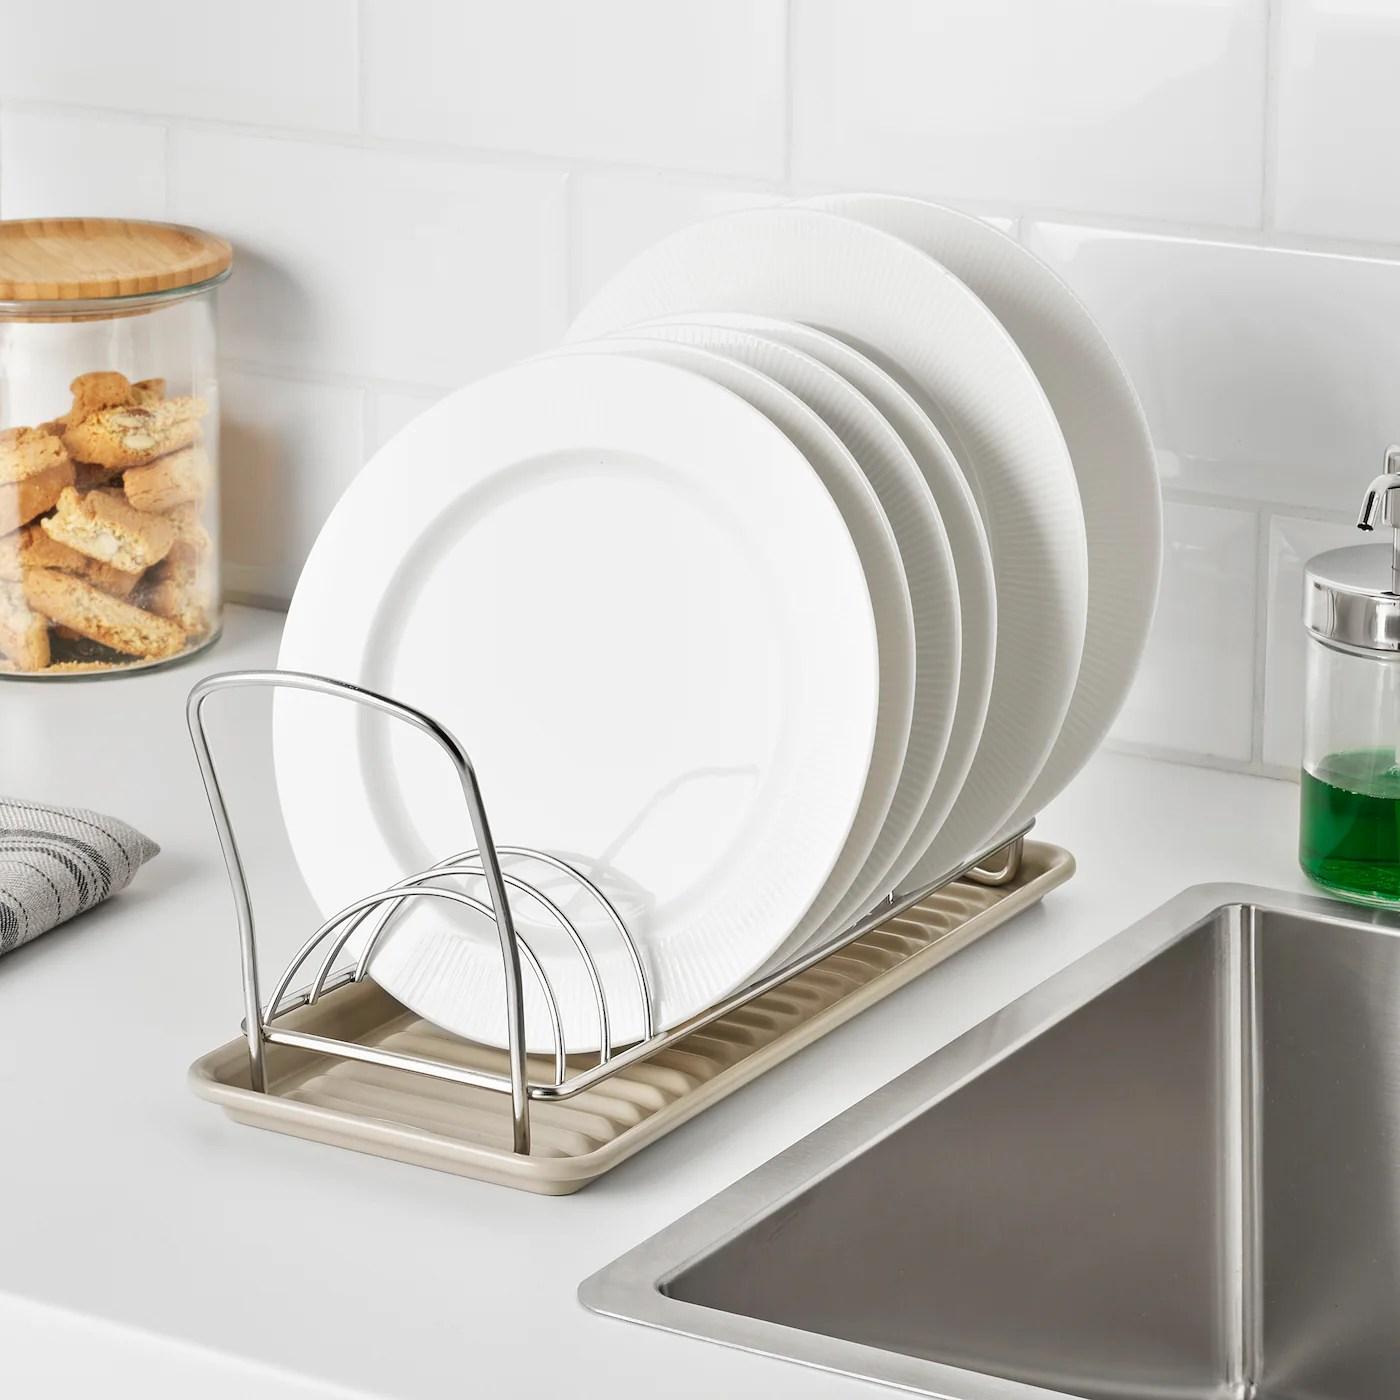 valvardad dish drying rack stainless steel 12x32 cm